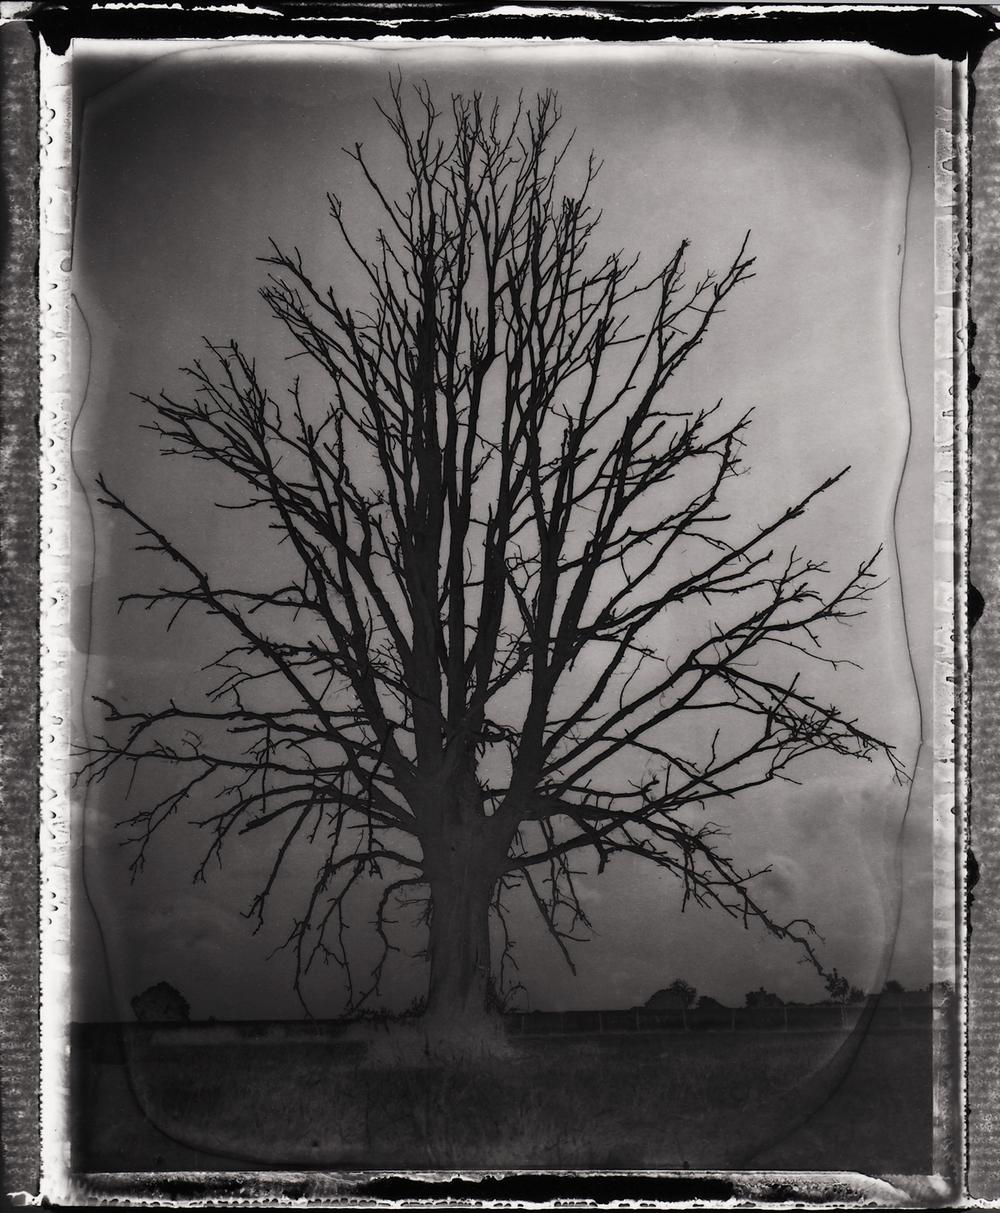 Pola-arbre 6.jpg